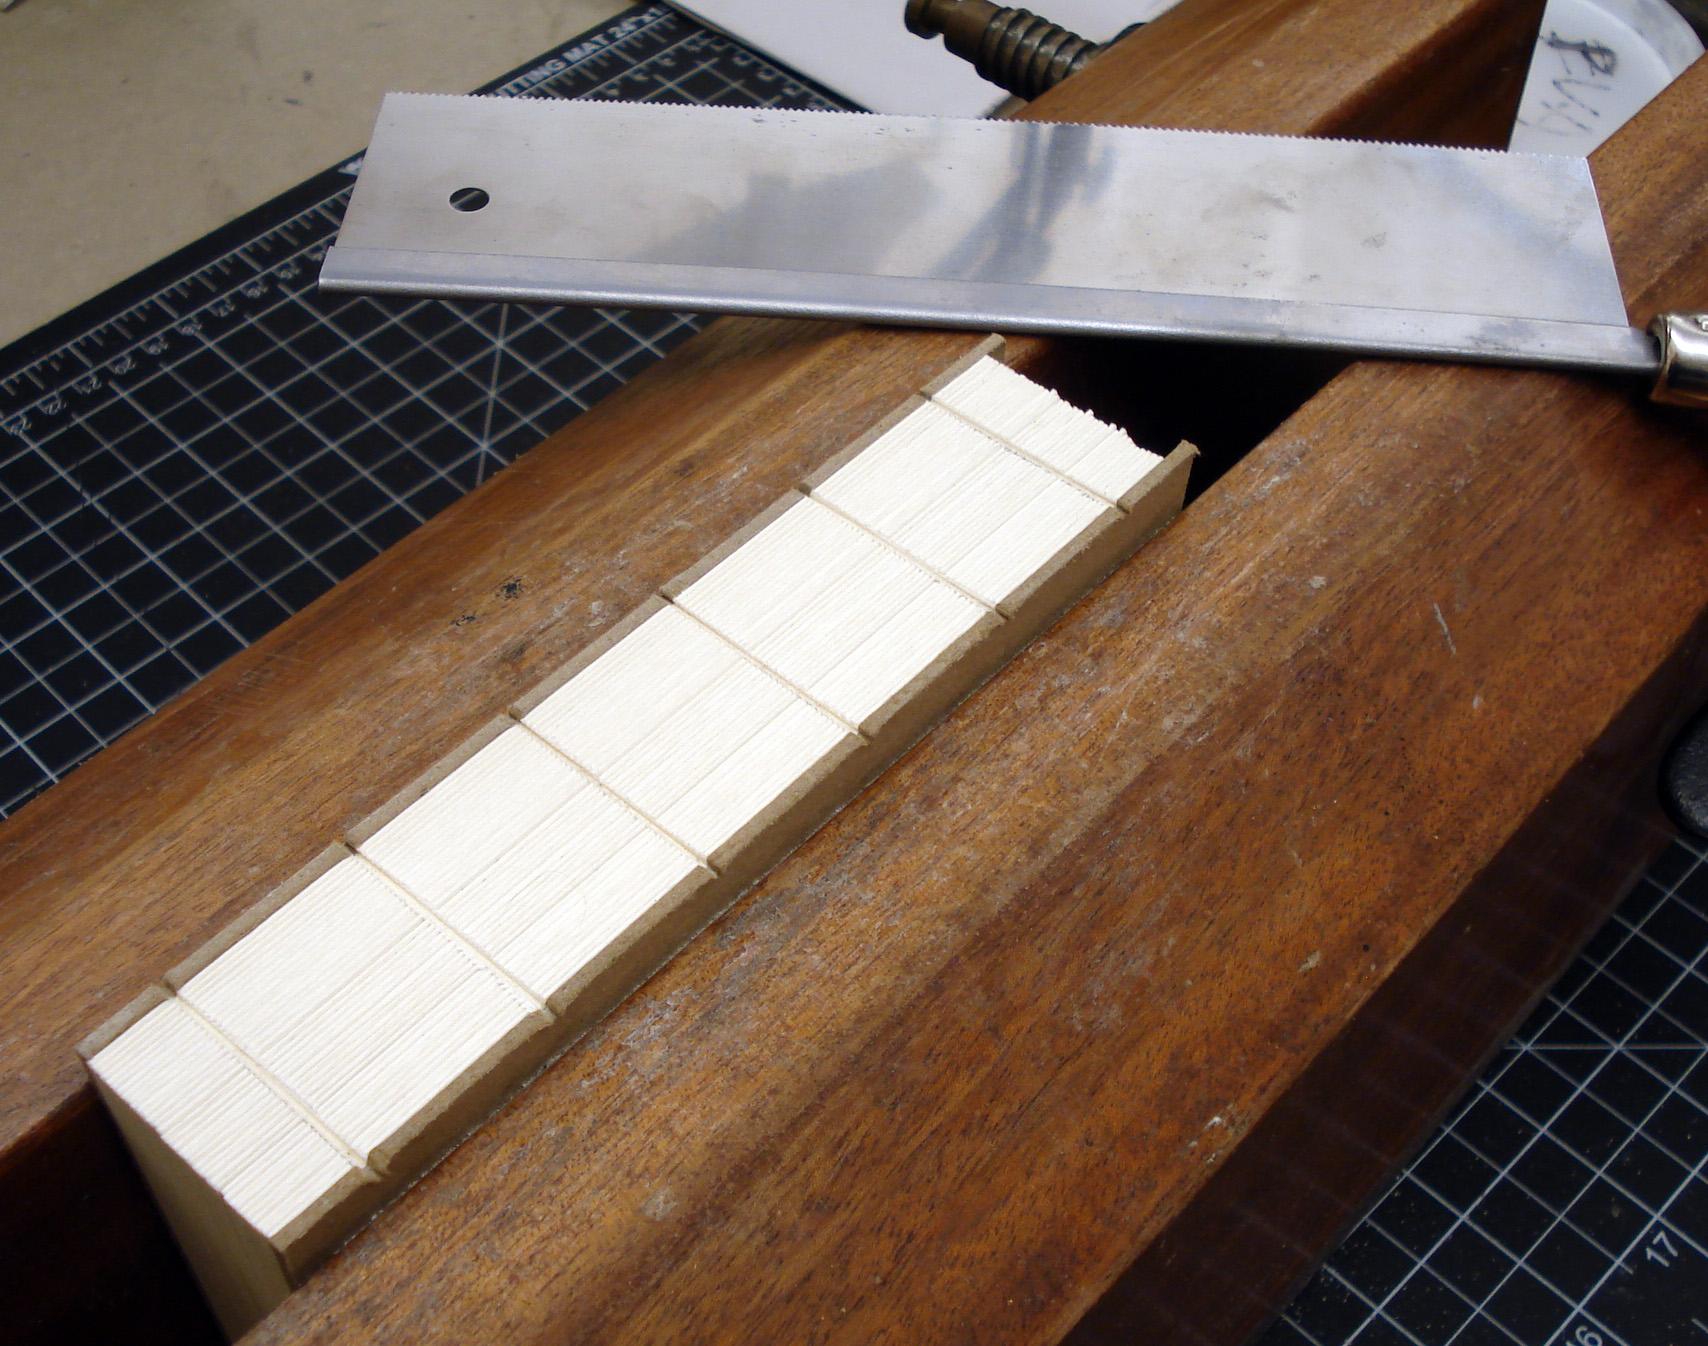 http://henryhebert.net/2011/11/16/german-paper-bindings-the-lapped-component/